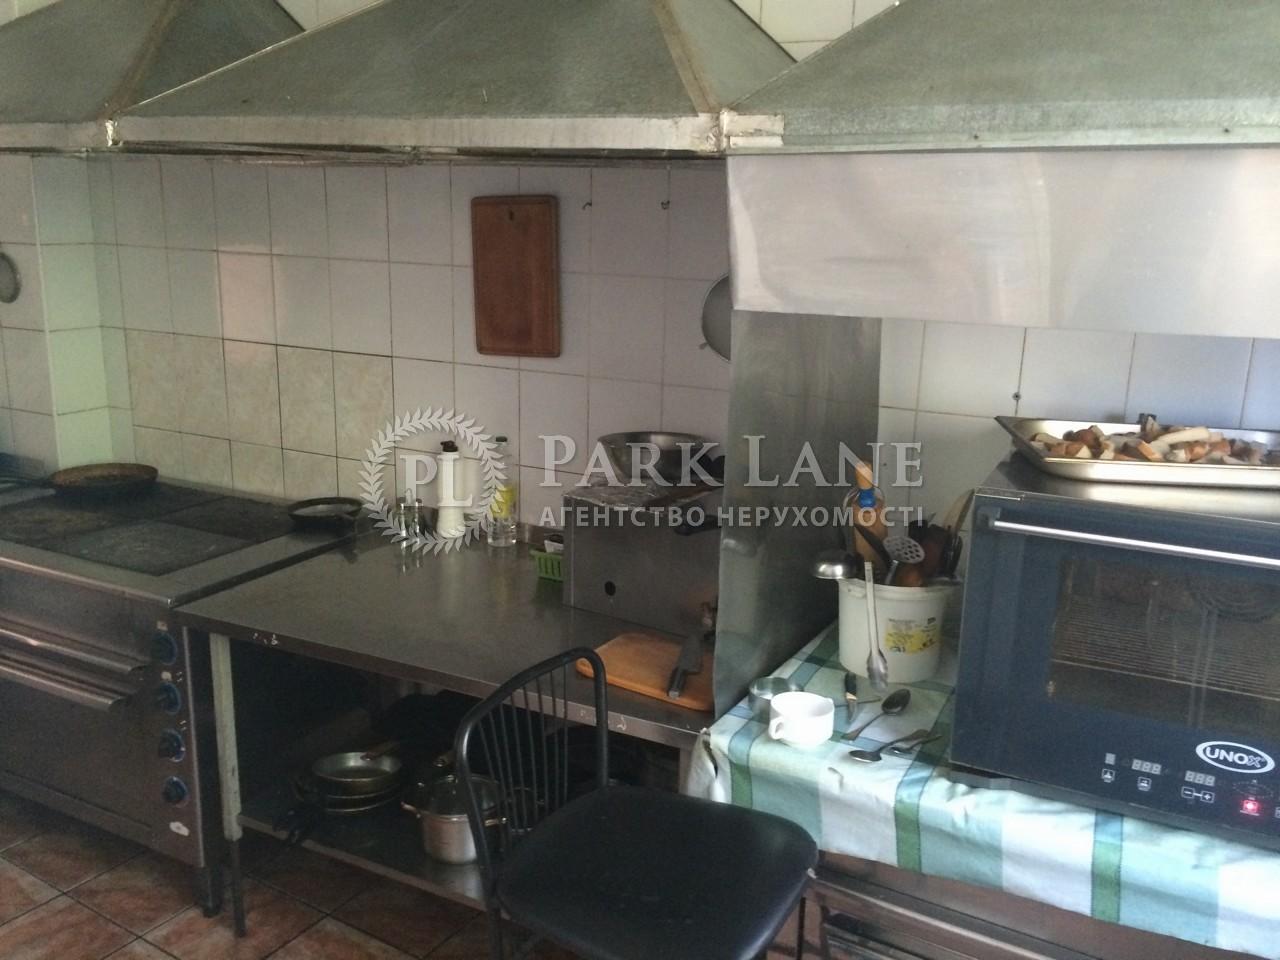 Ресторан, J-25790, Приозерная, Киев - Фото 12